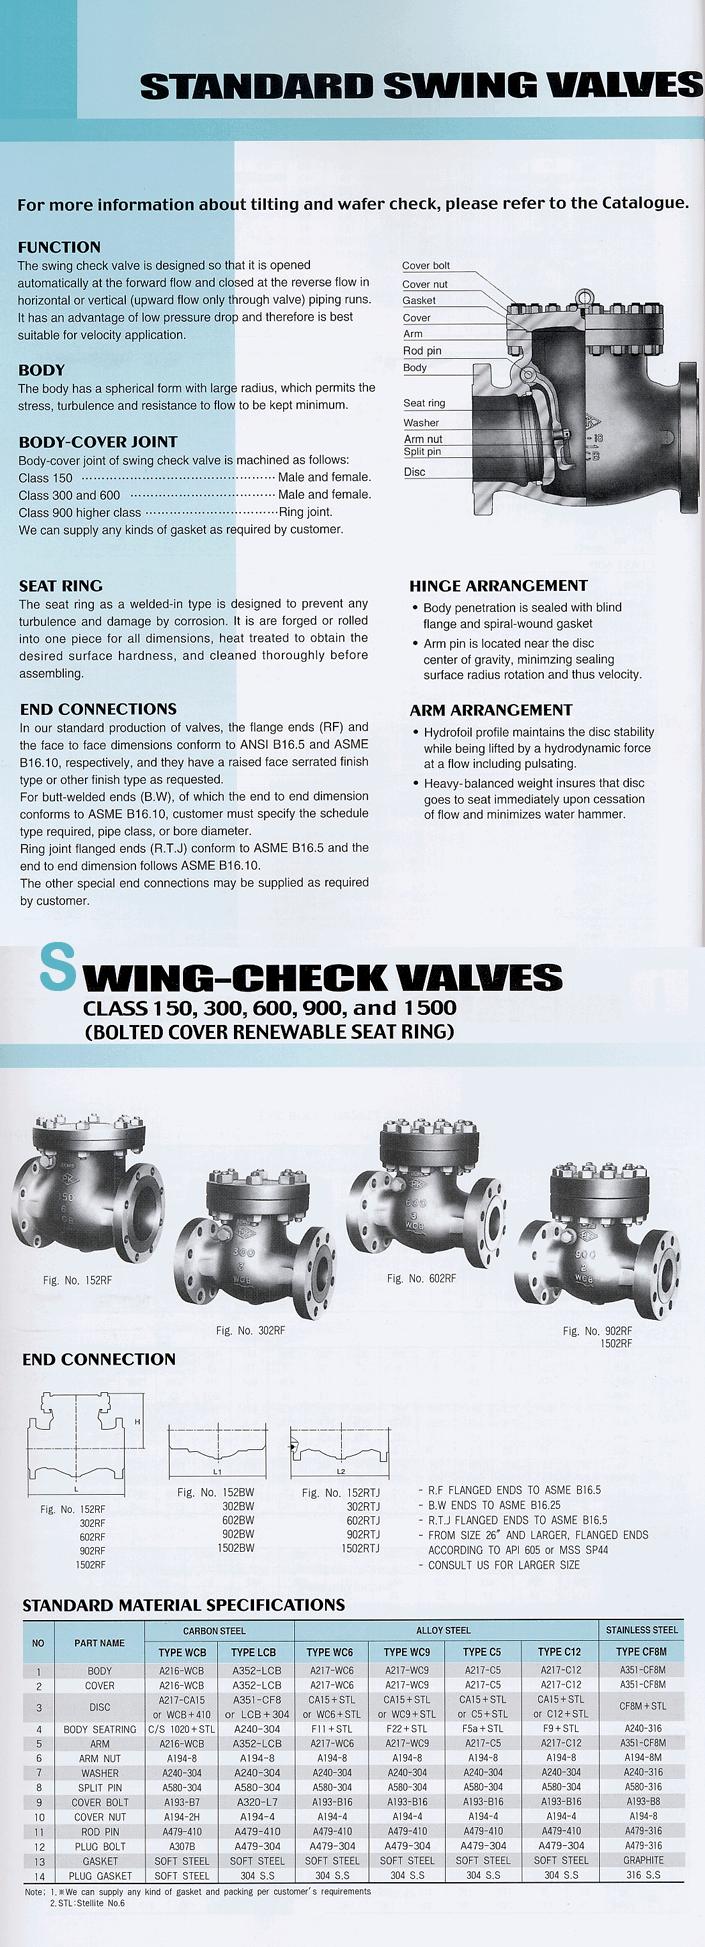 Seyoung Petro Filter Corporation Casting Valve - Check Valve